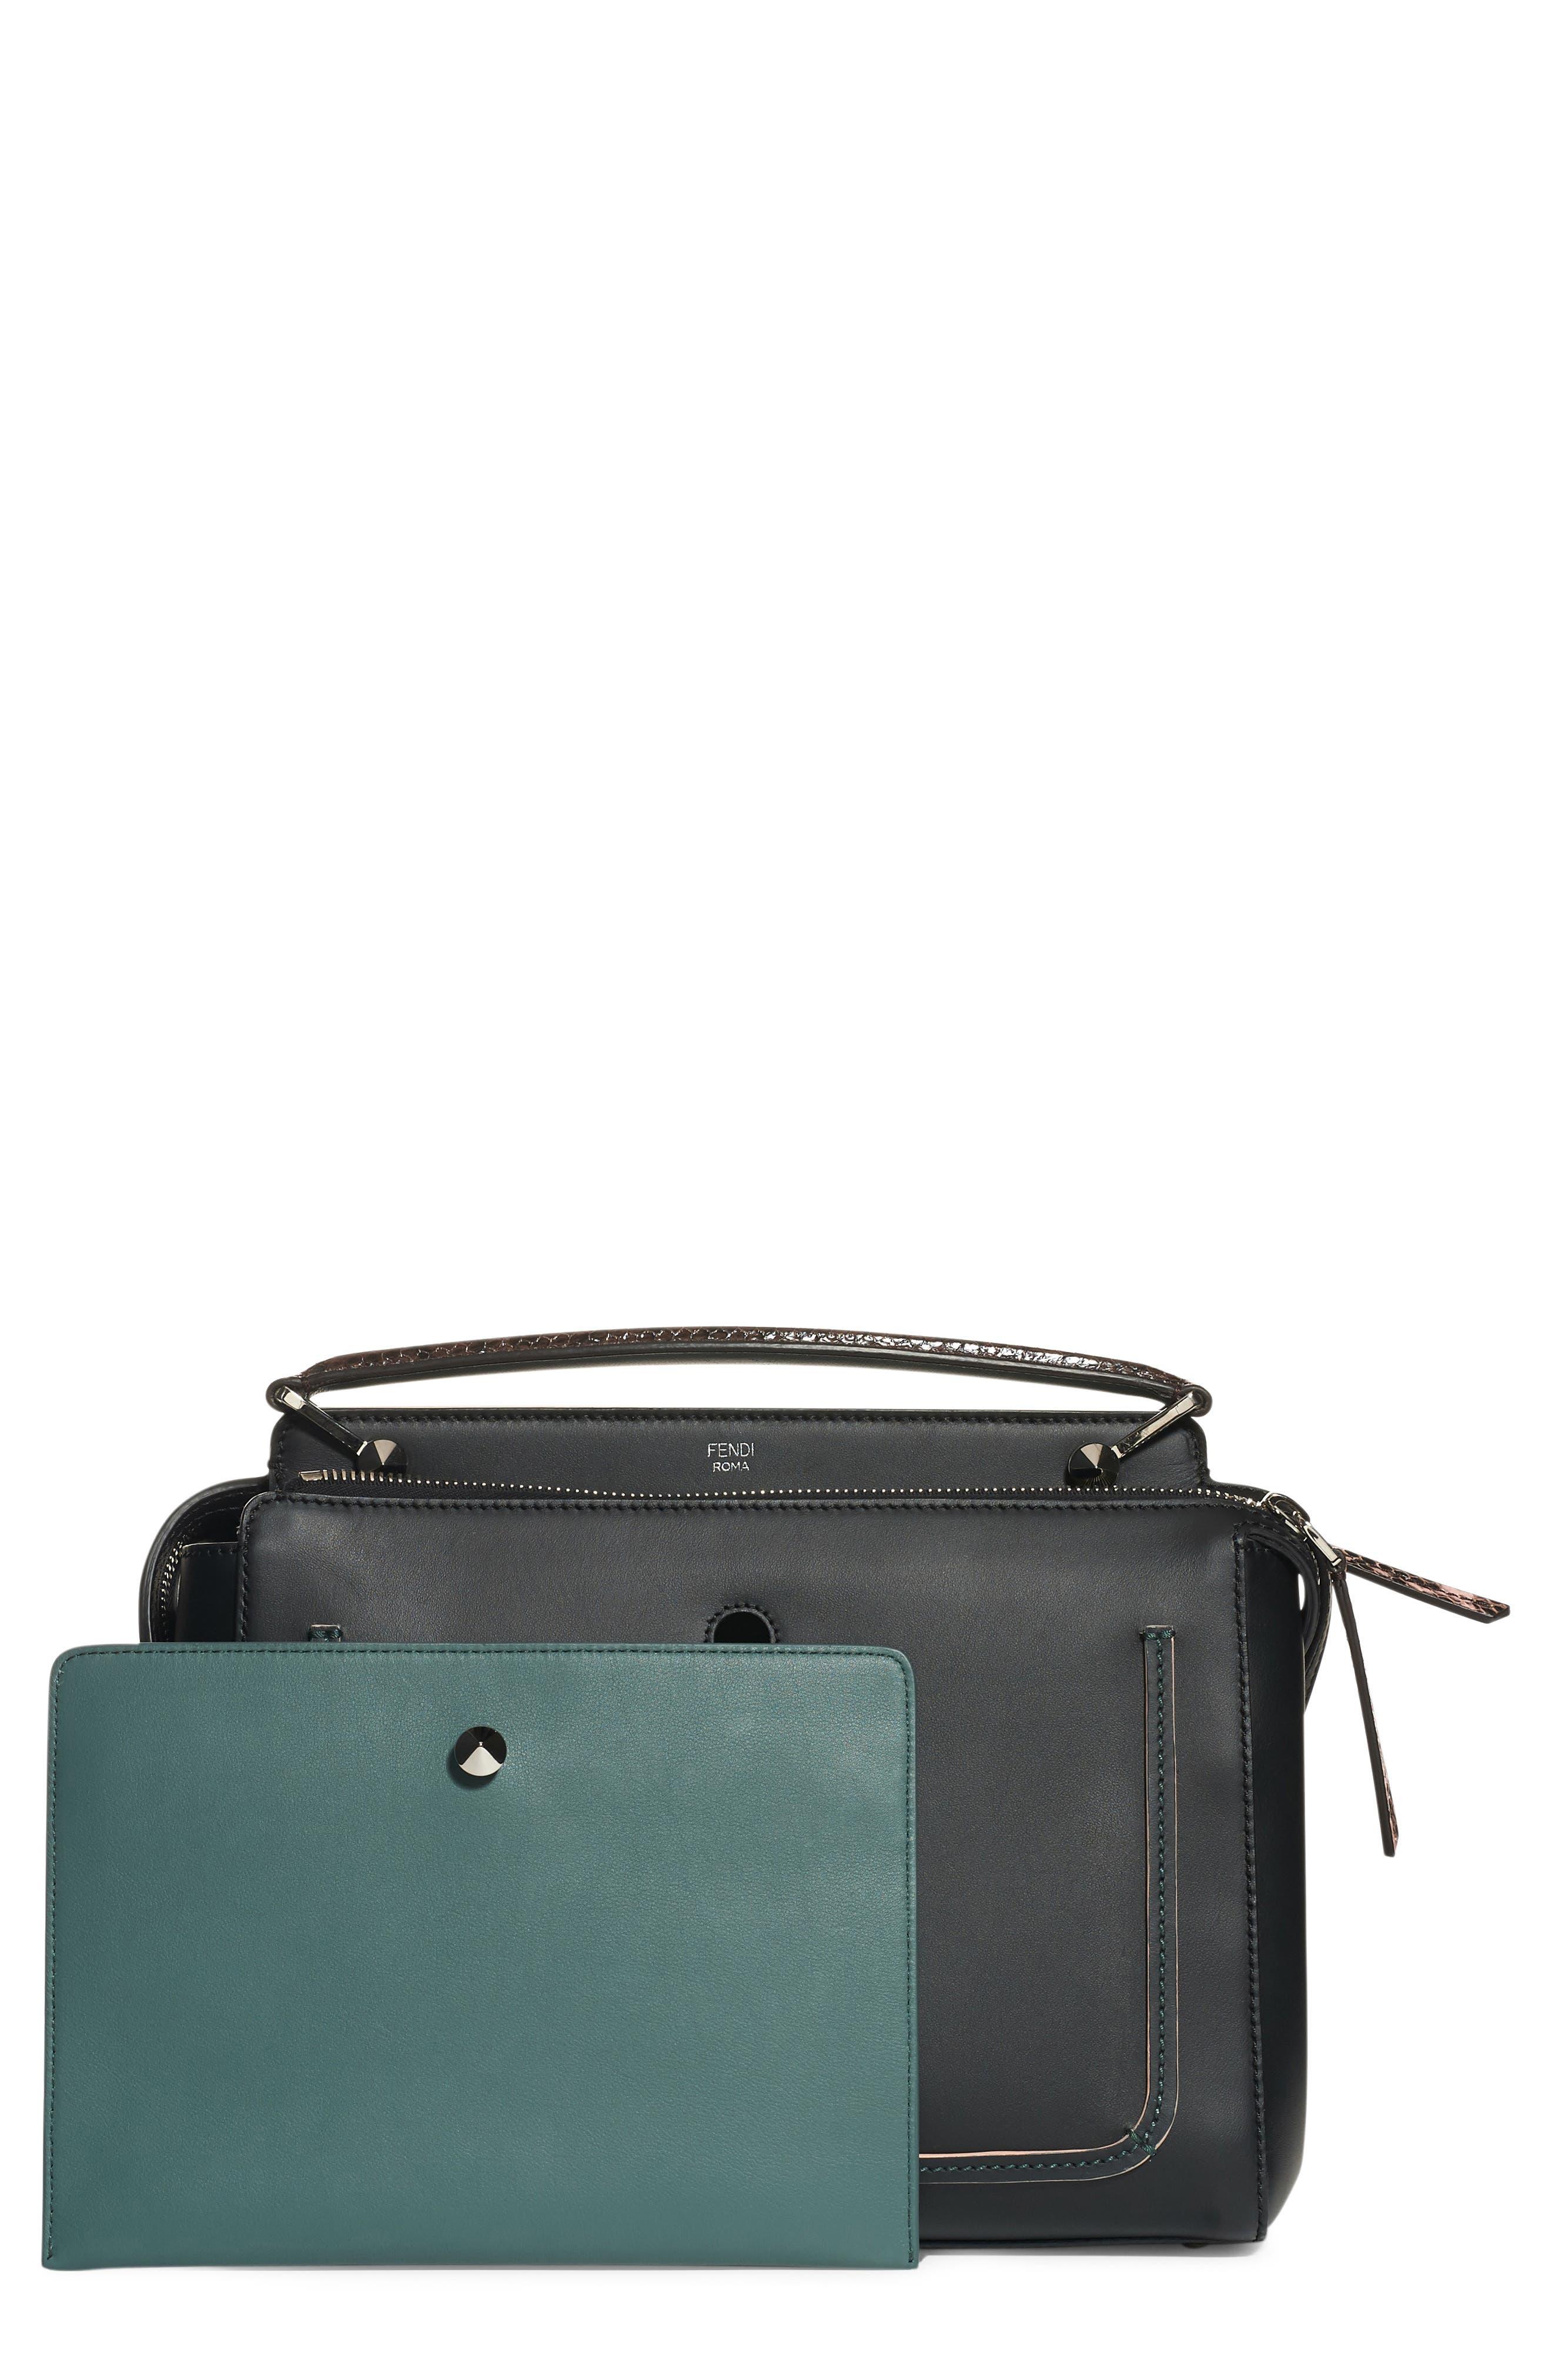 'DOTCOM' Leather & Genuine Snakeskin Satchel,                         Main,                         color, 009